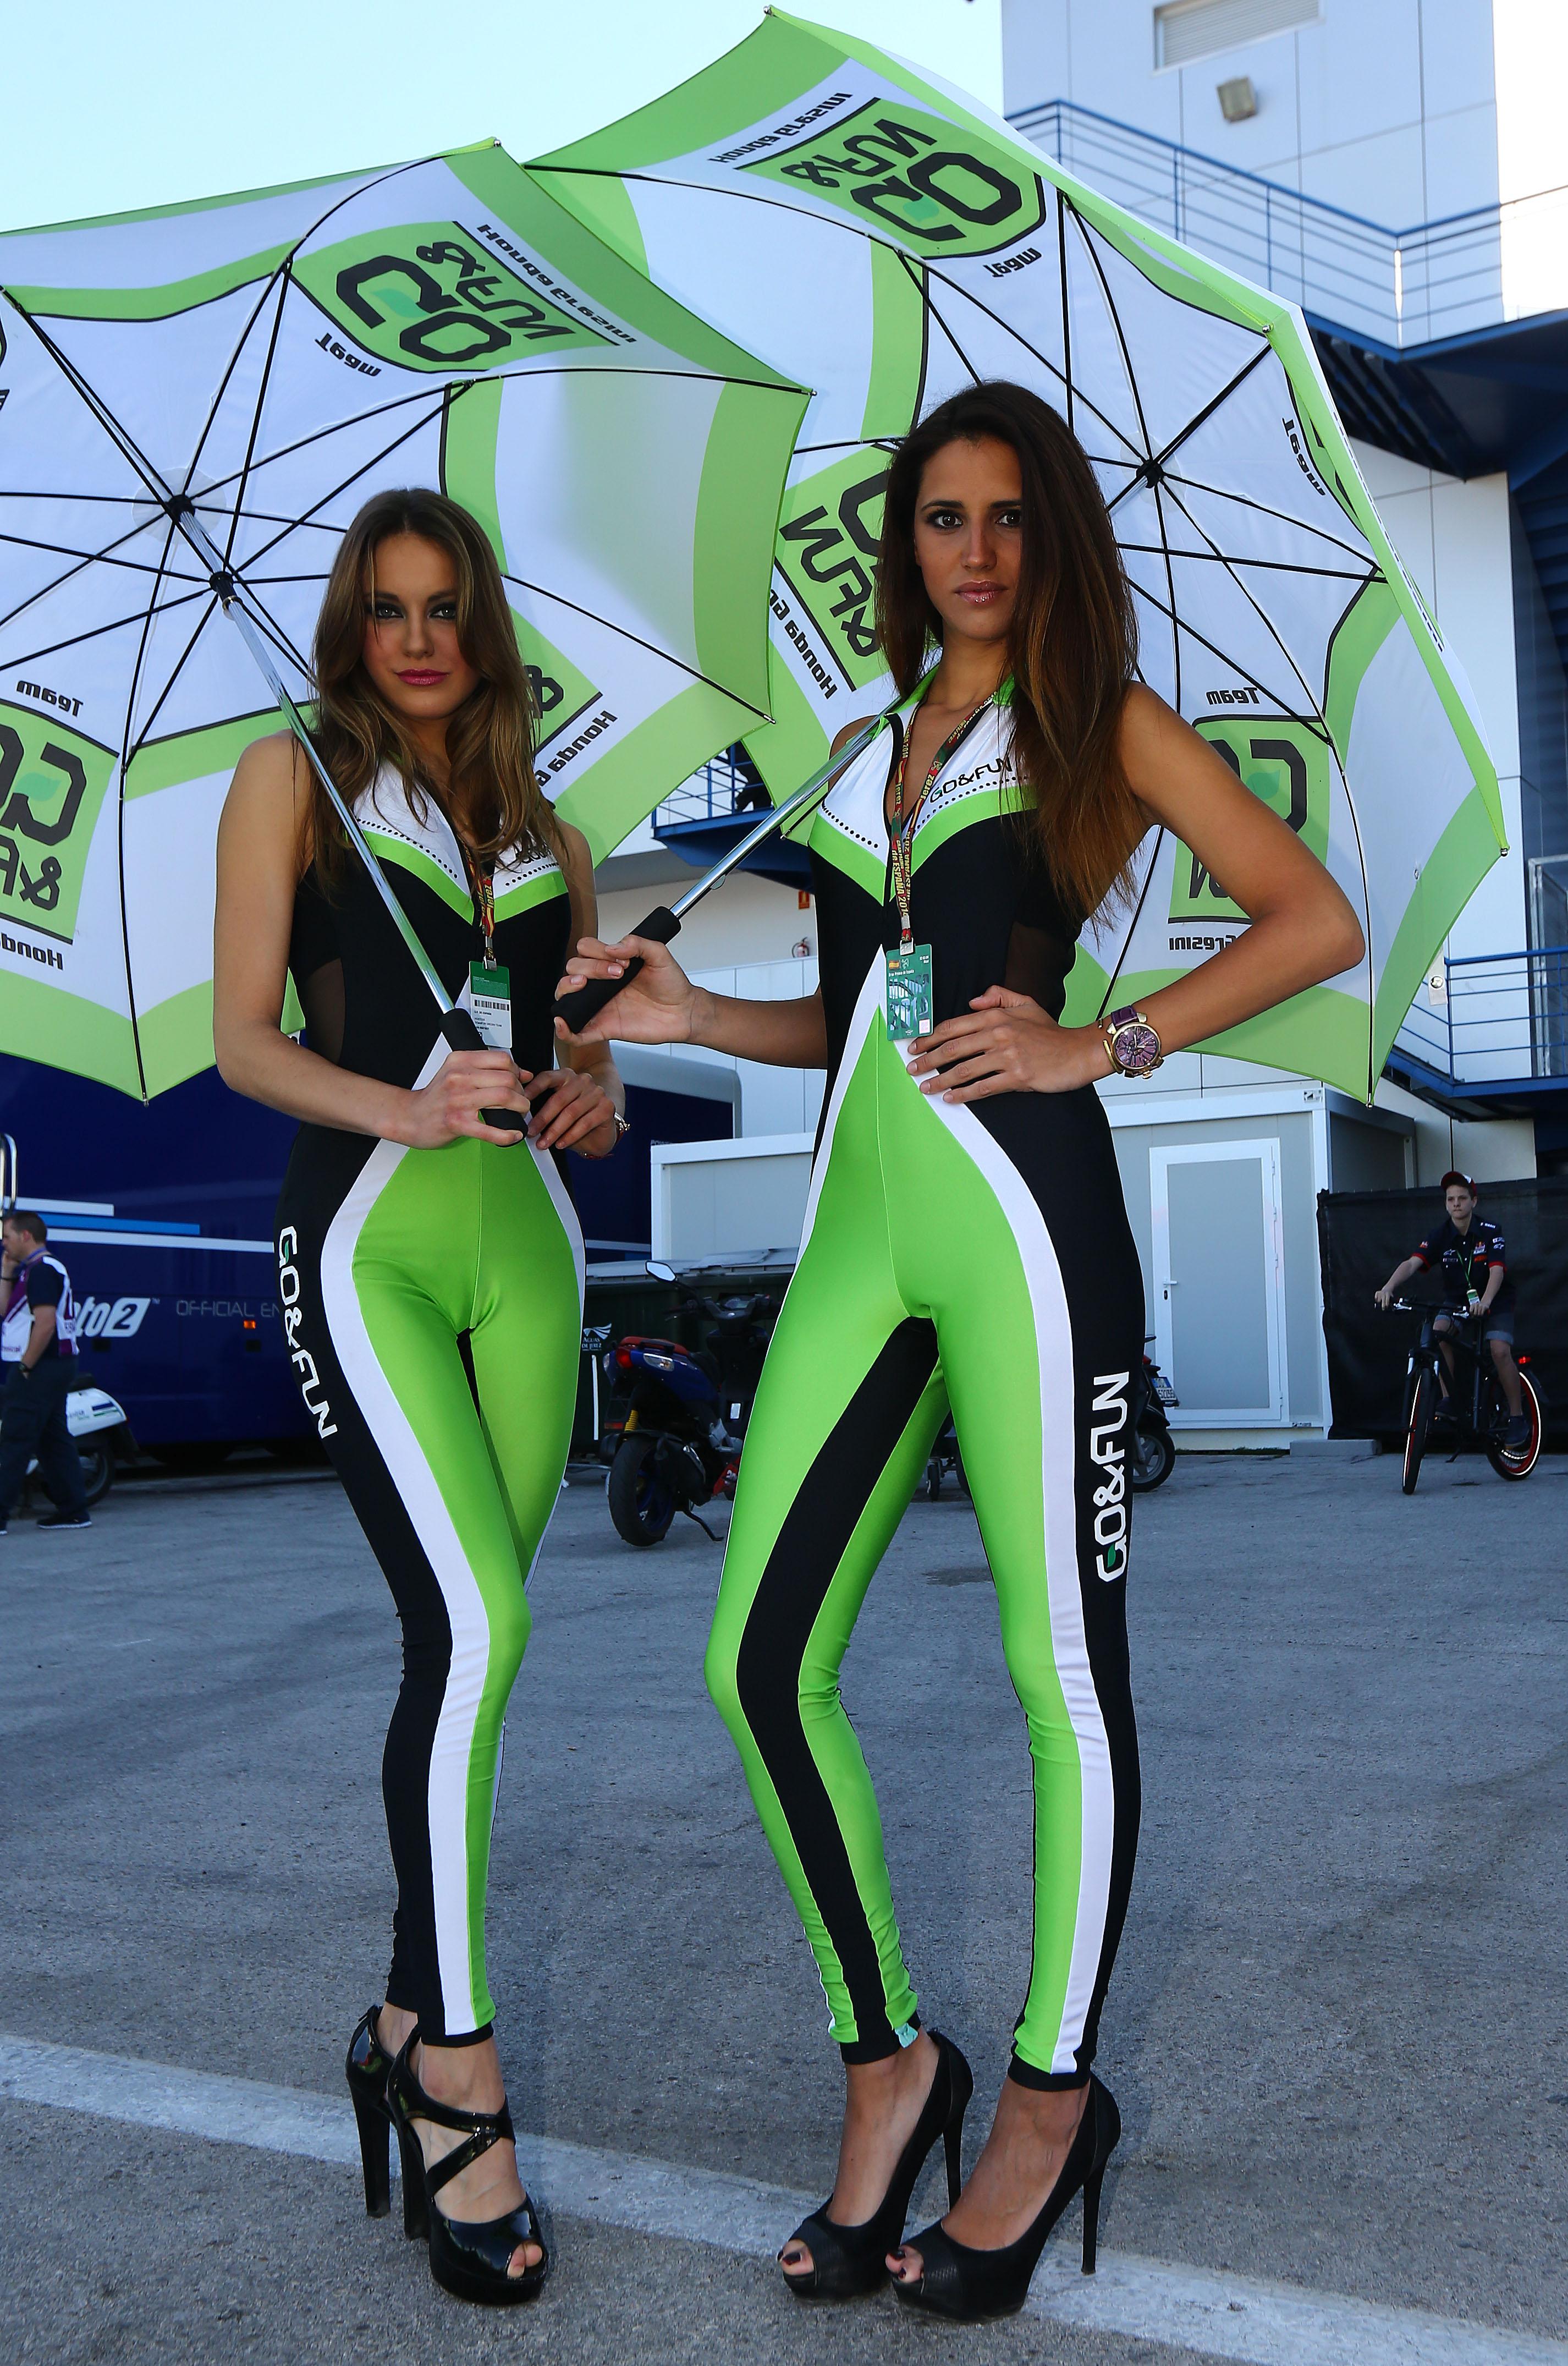 MotoGP Jerez paddock girls 2014 | Visordown